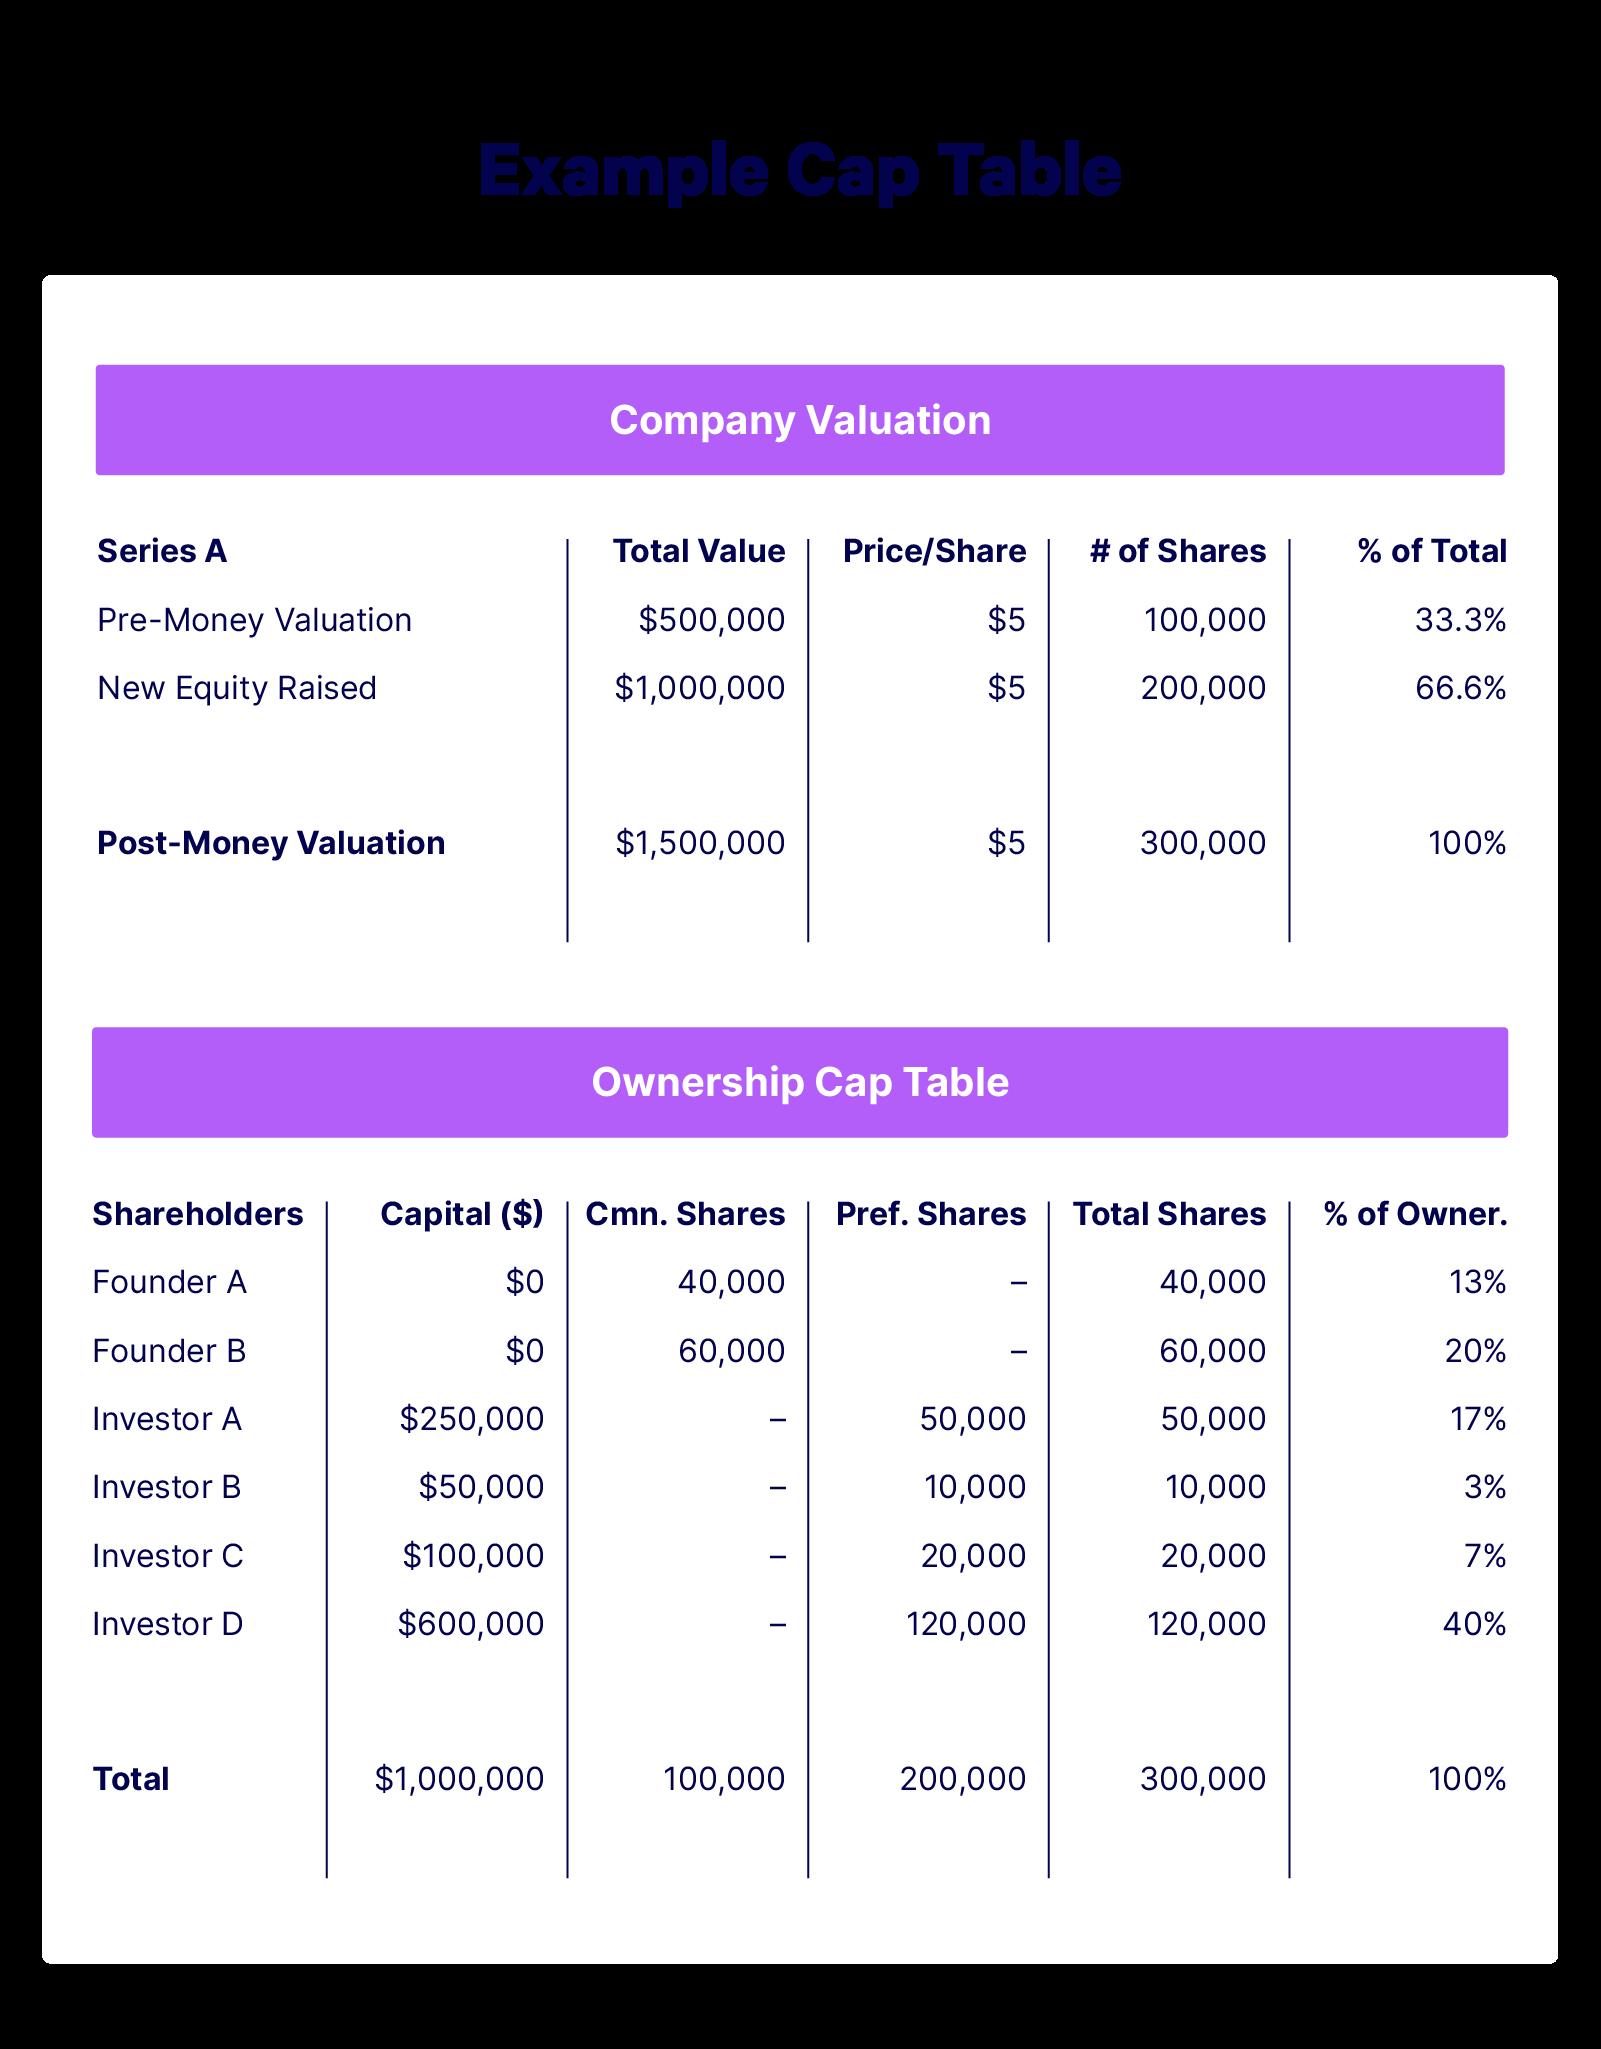 An Example Cap Table